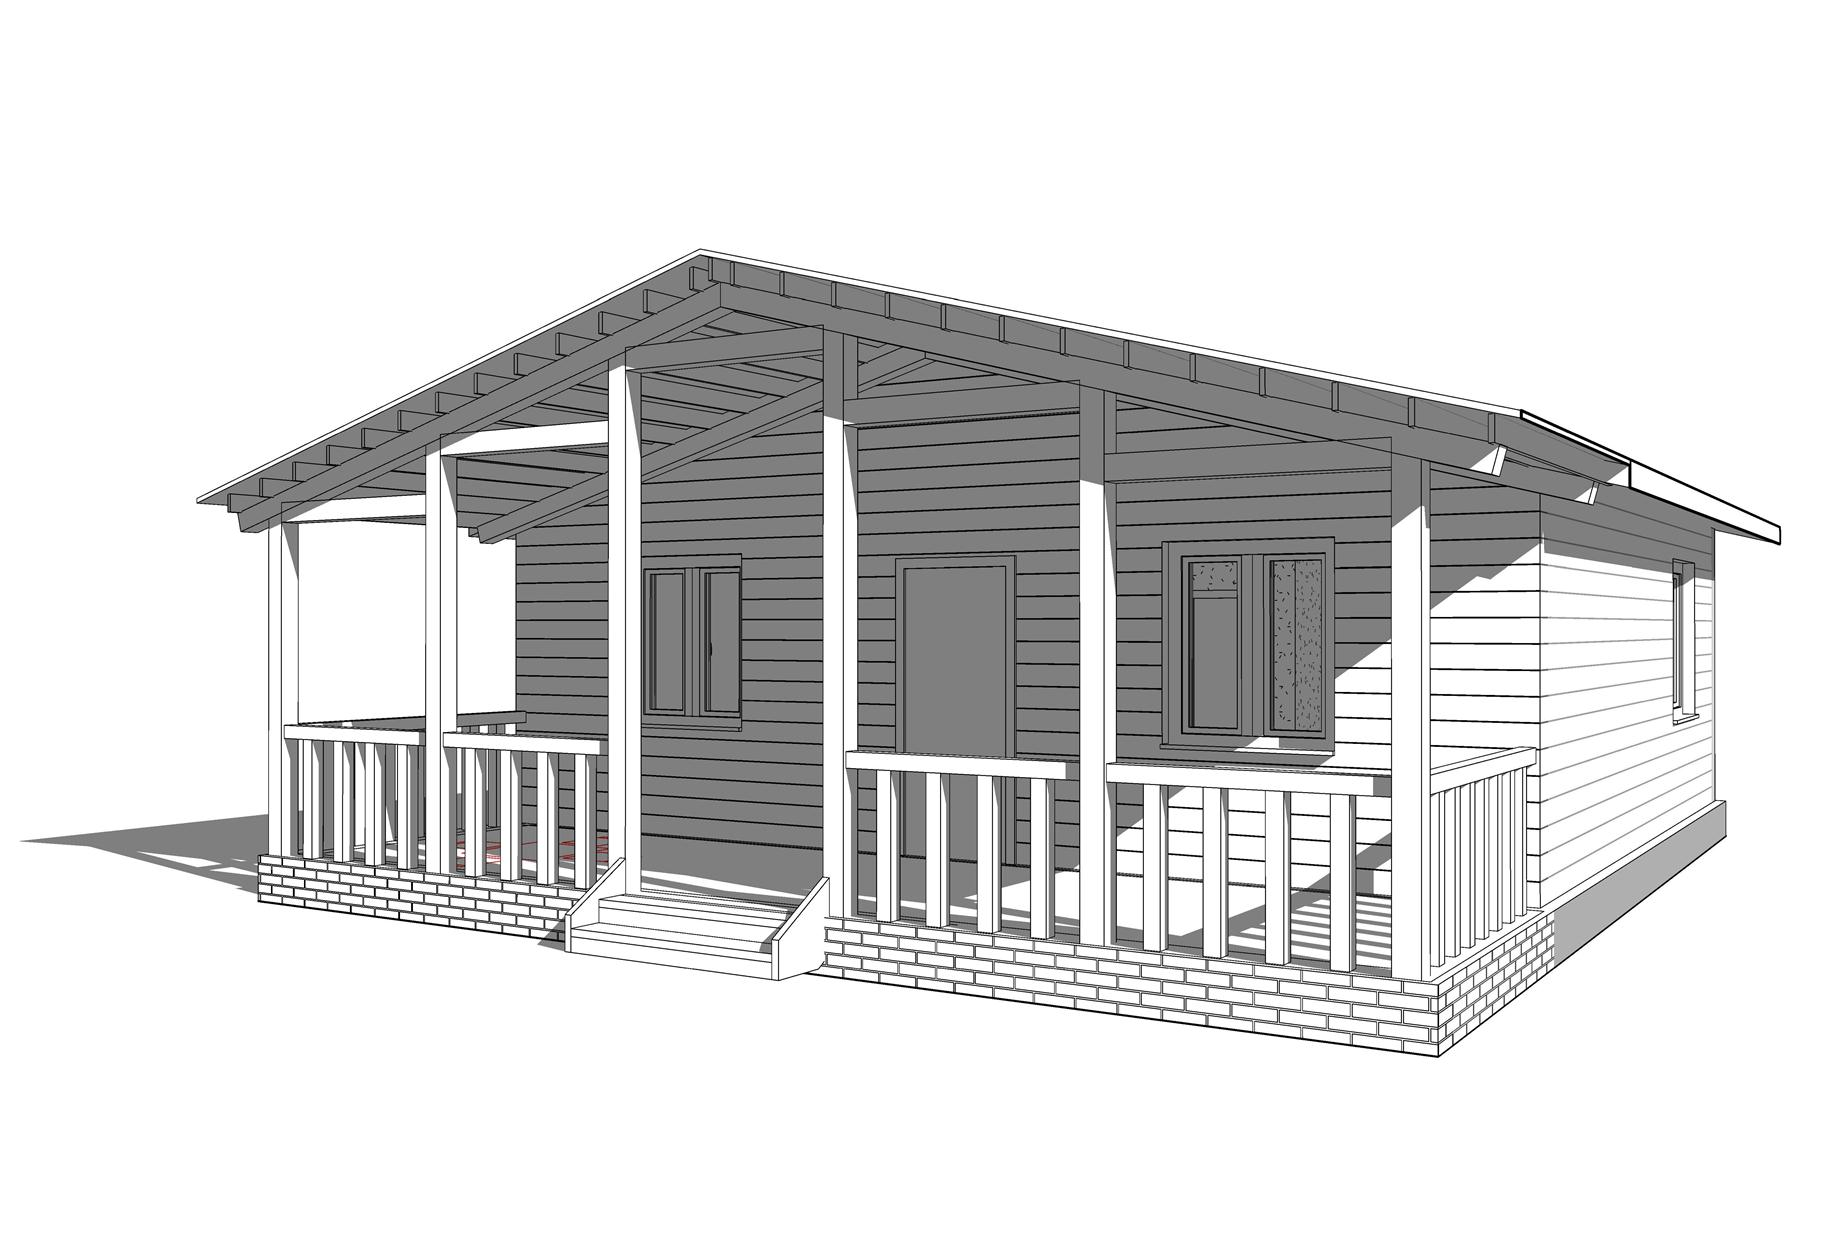 Визуализация дома 60м2 с террасой